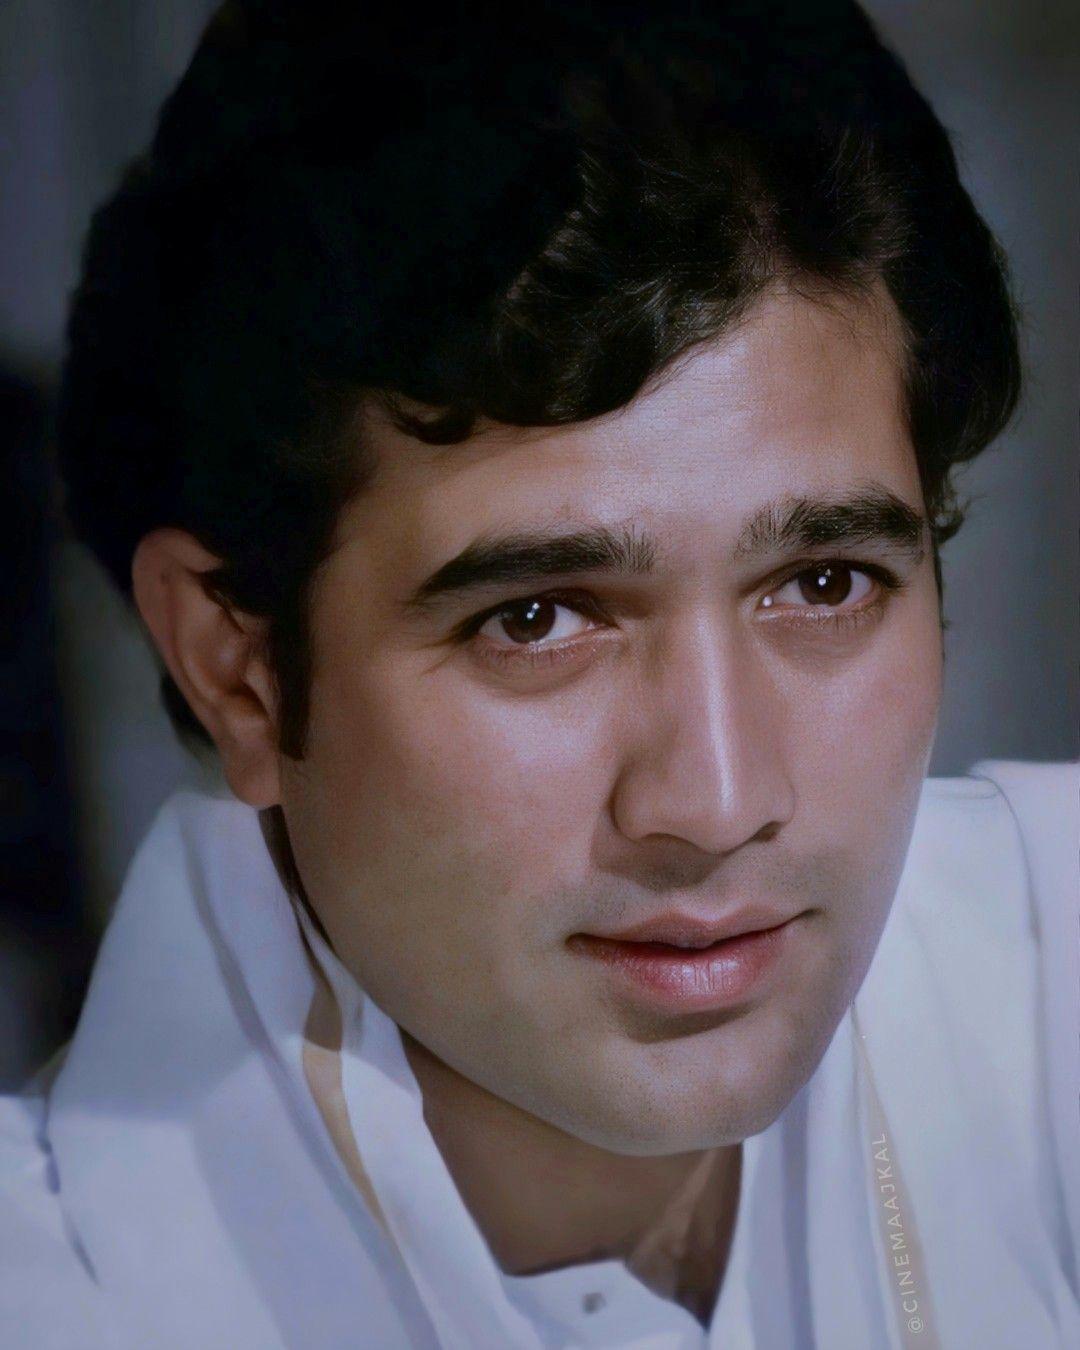 Rajesh Khanna | Most handsome actors, Rajesh khanna, Vintage bollywood